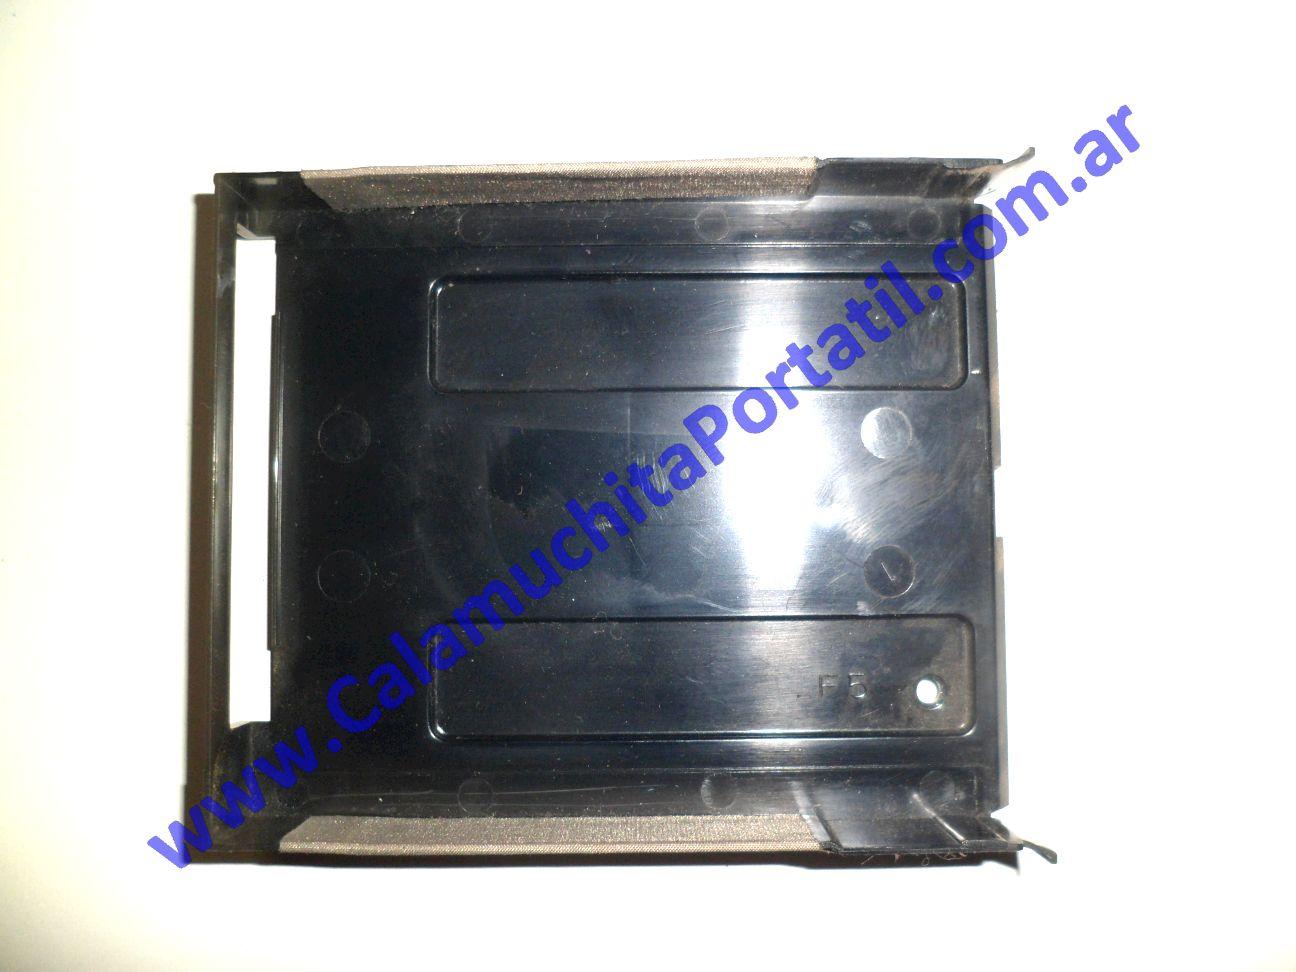 0023GCA Carry Disk Toshiba Satellite A60-SP159